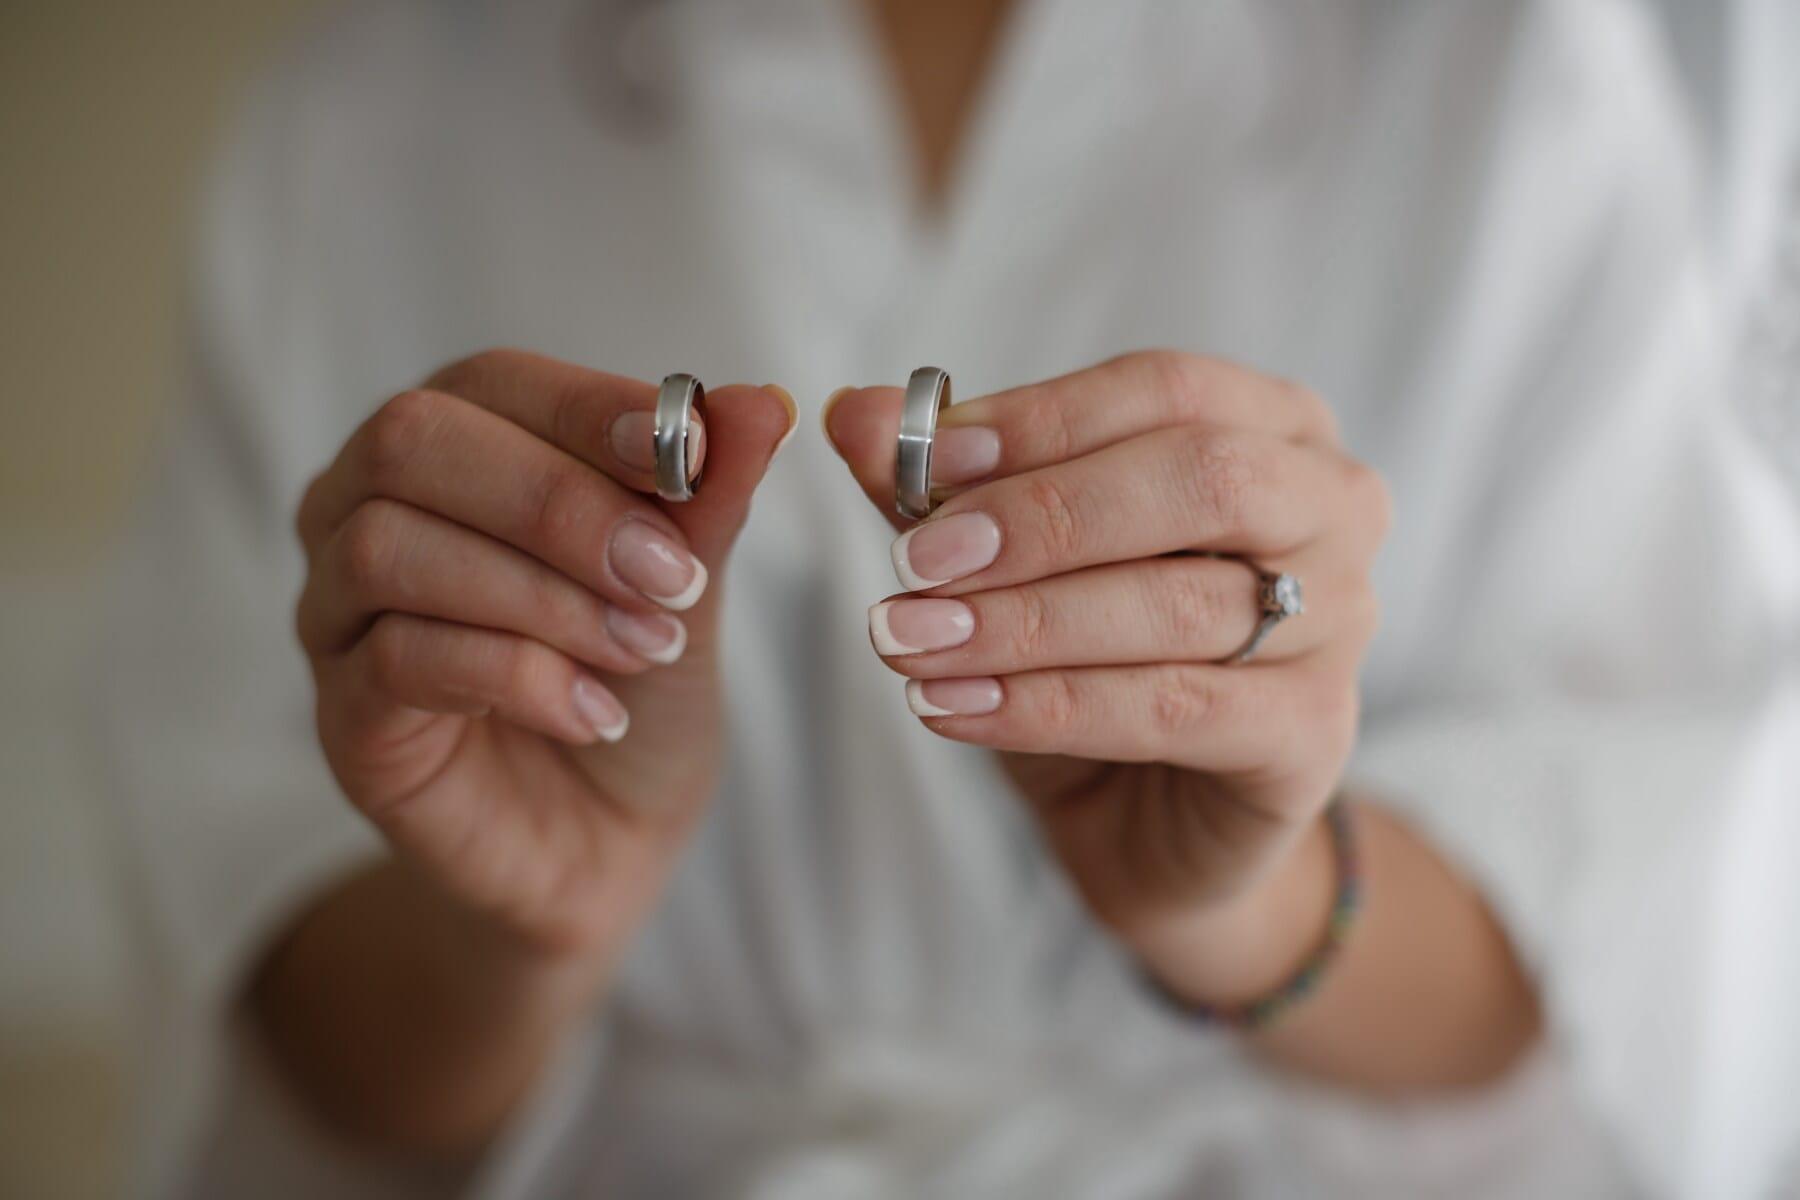 paar, Ehering, Ringe, Nagelpolitur, Maniküre, Hände, Hand, Finger, Braut, Frau